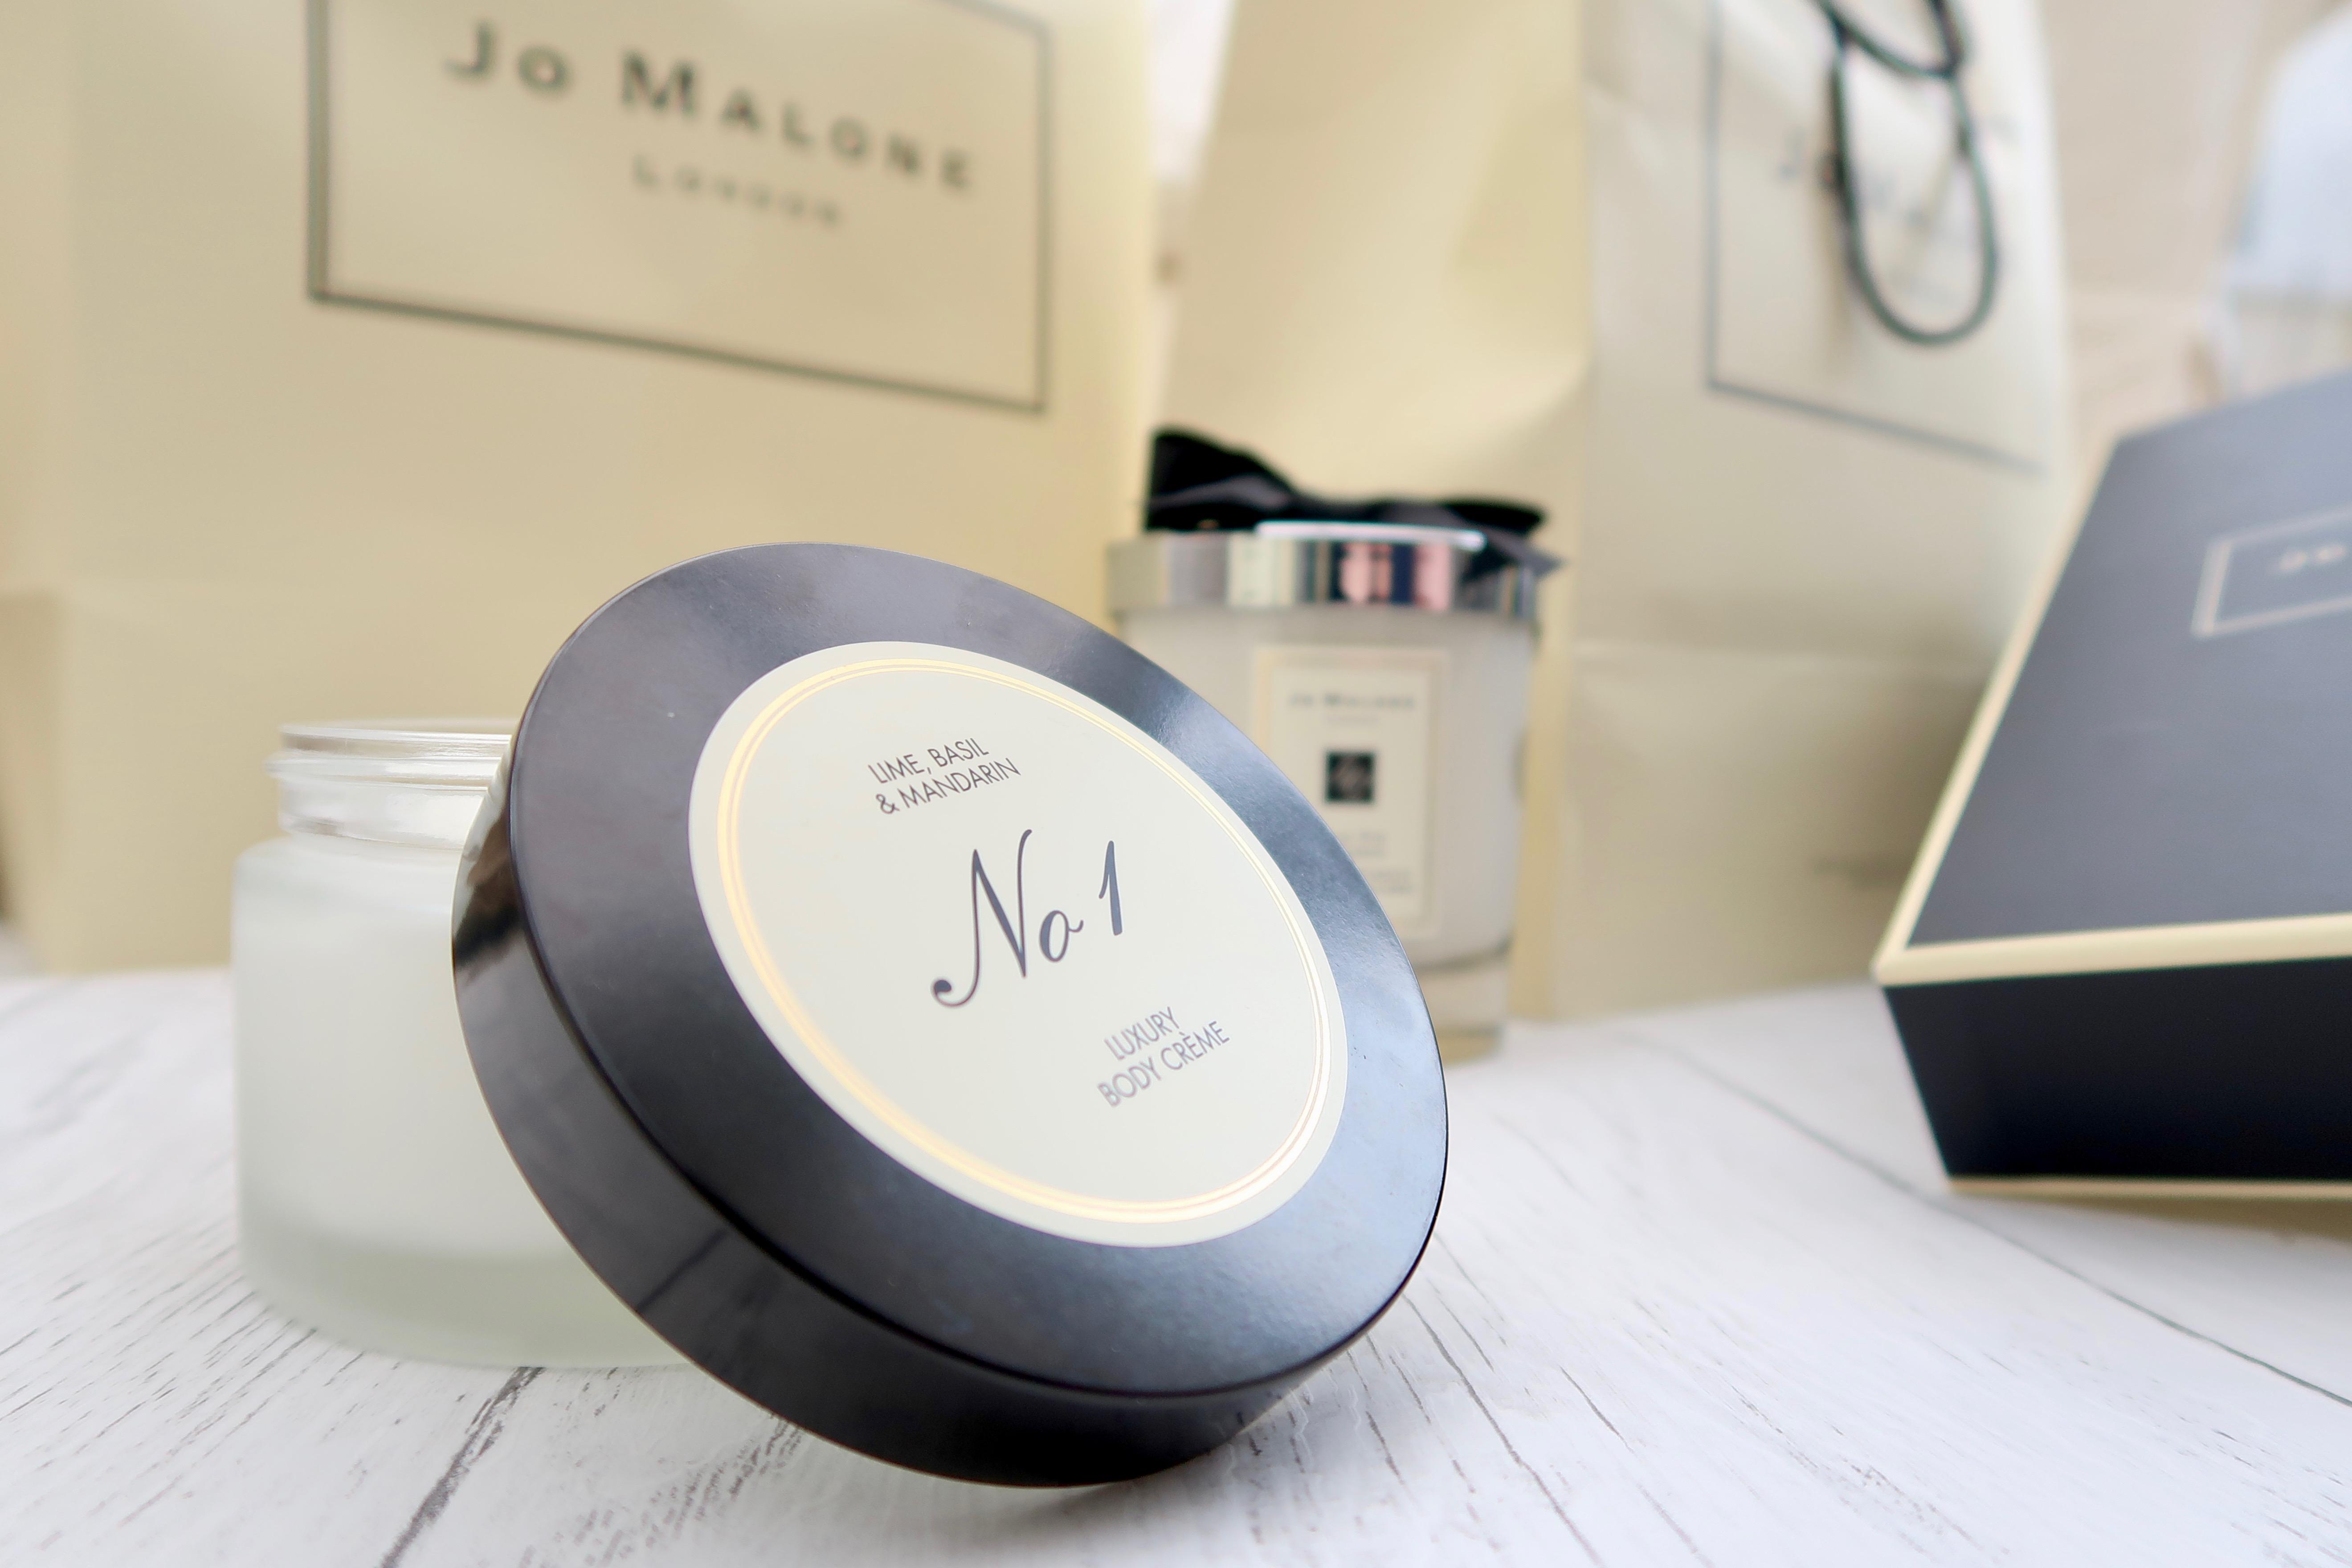 Jo Malone vs Aldi Number | Splurge vs Save | Honest Review of the new Aldi bath & body range | Elle Blonde Luxury Lifestyle Destination Blog